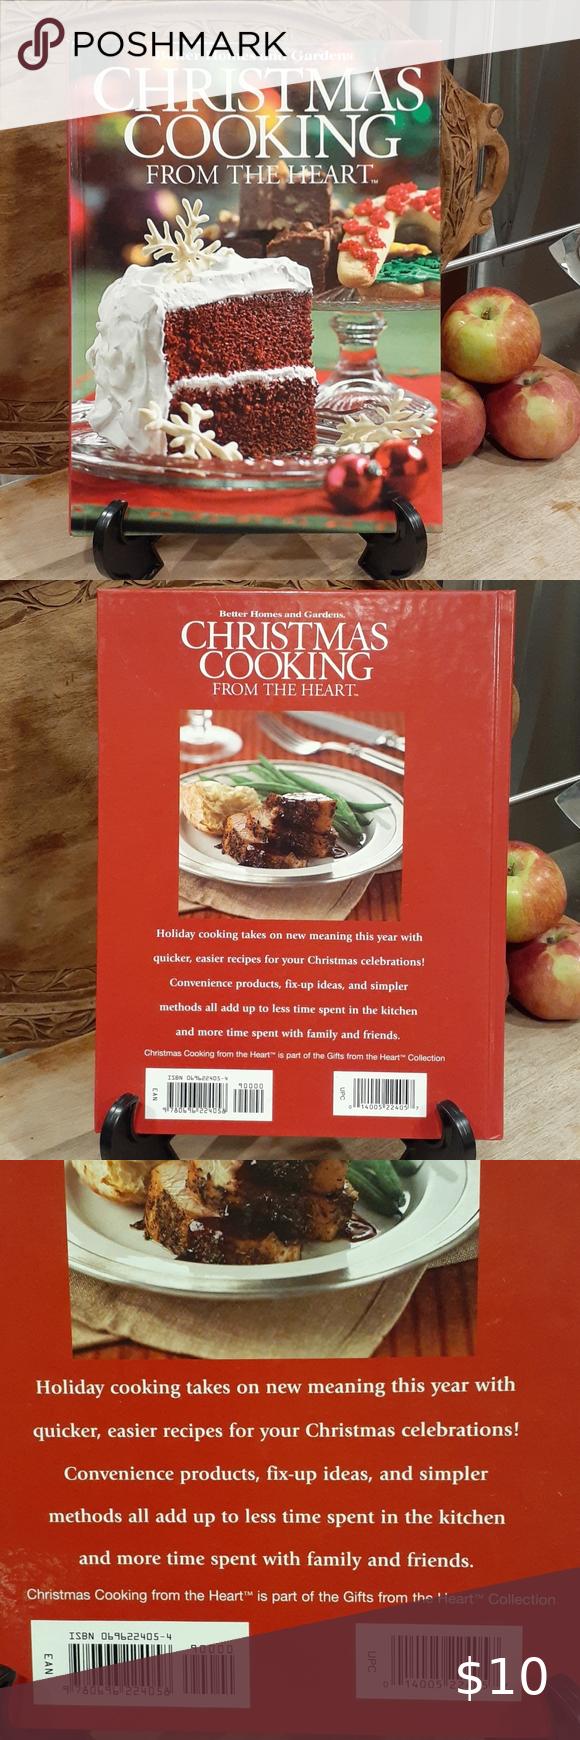 b2c552d64ca86a4cd41c8ae30f0ec975 - Better Homes And Gardens Christmas Cookbook